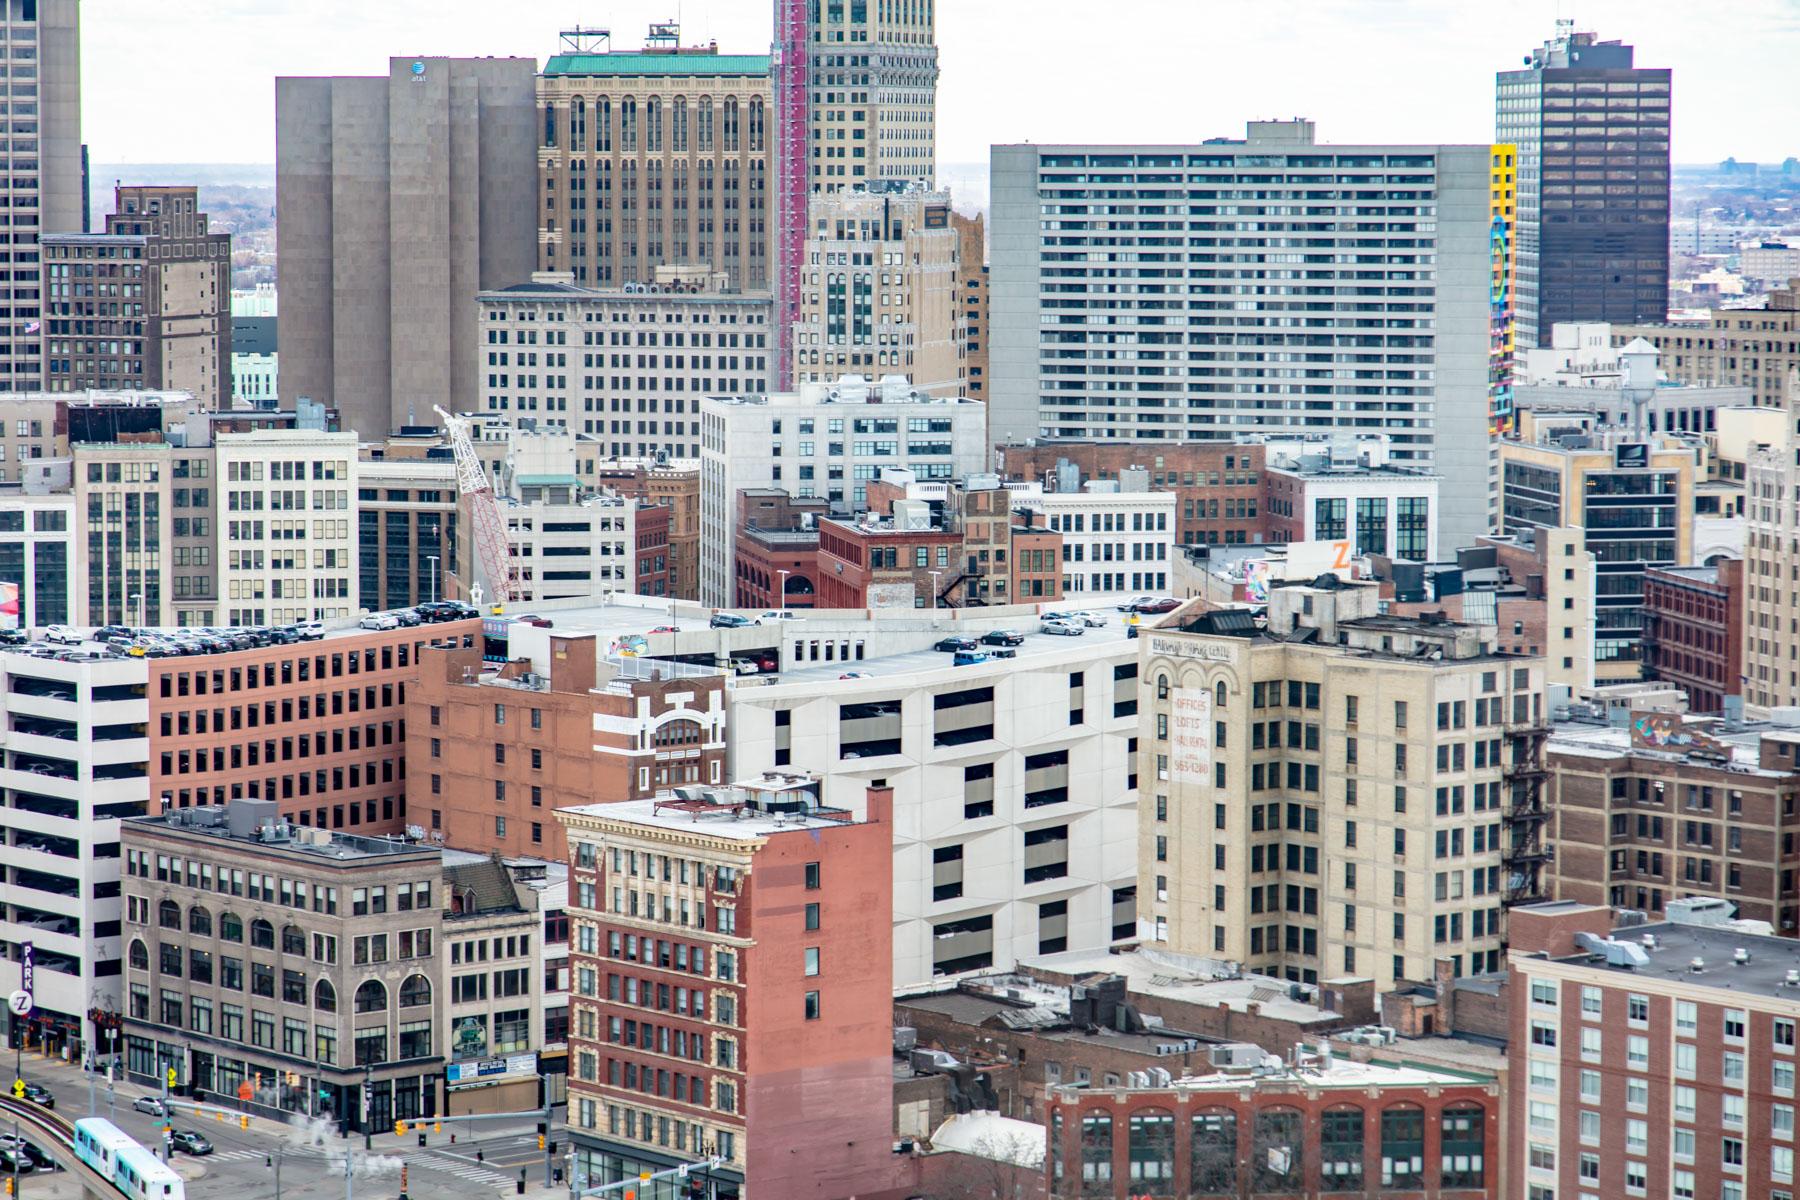 City pics GtCH Rooftop - 1z3a7260